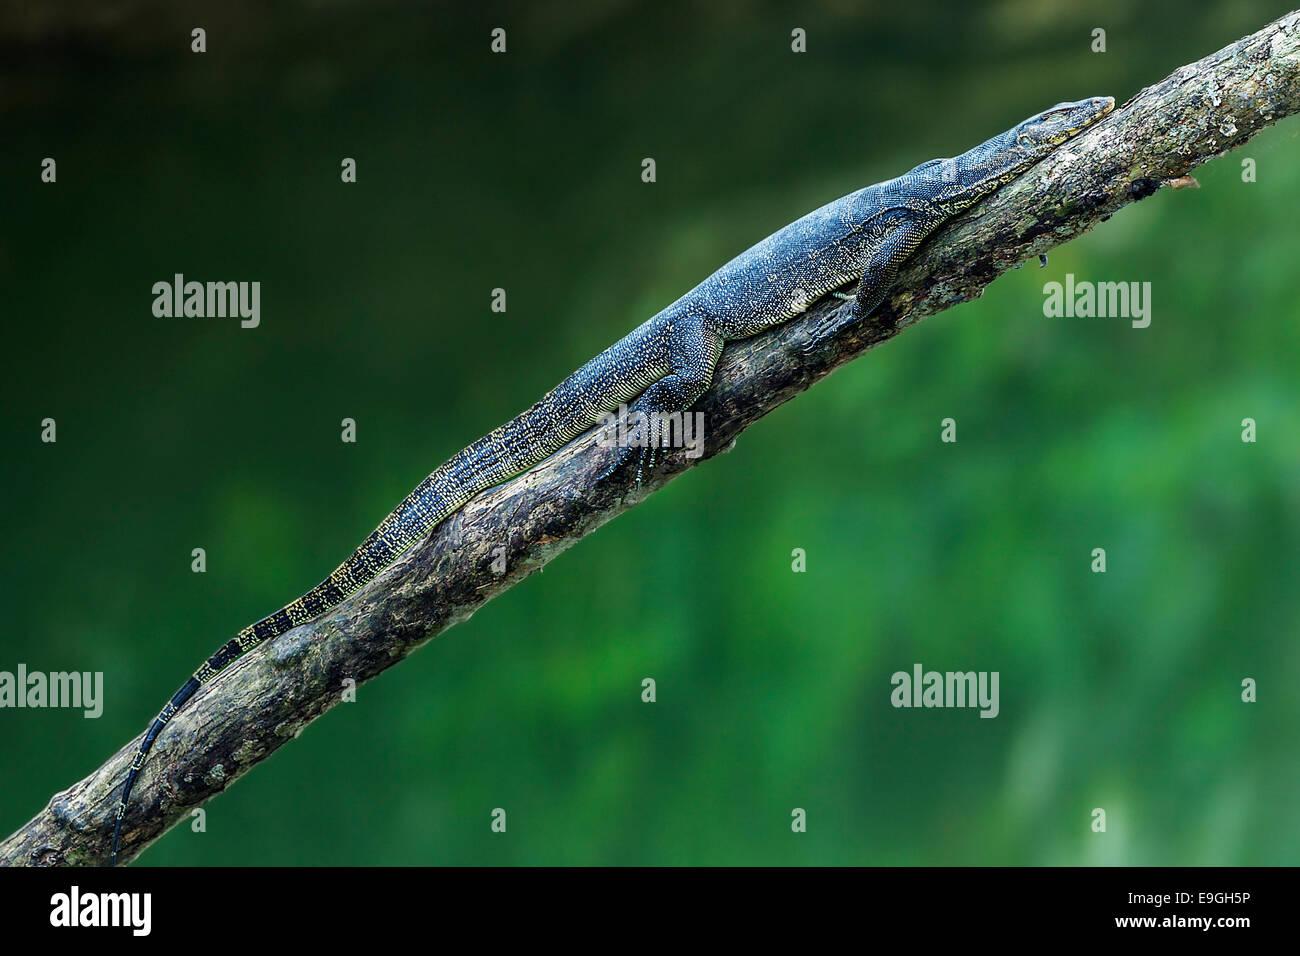 Malayan Water Monitor Lizard (Varanus salvator) sleeping on a mangrove tree - Stock Image